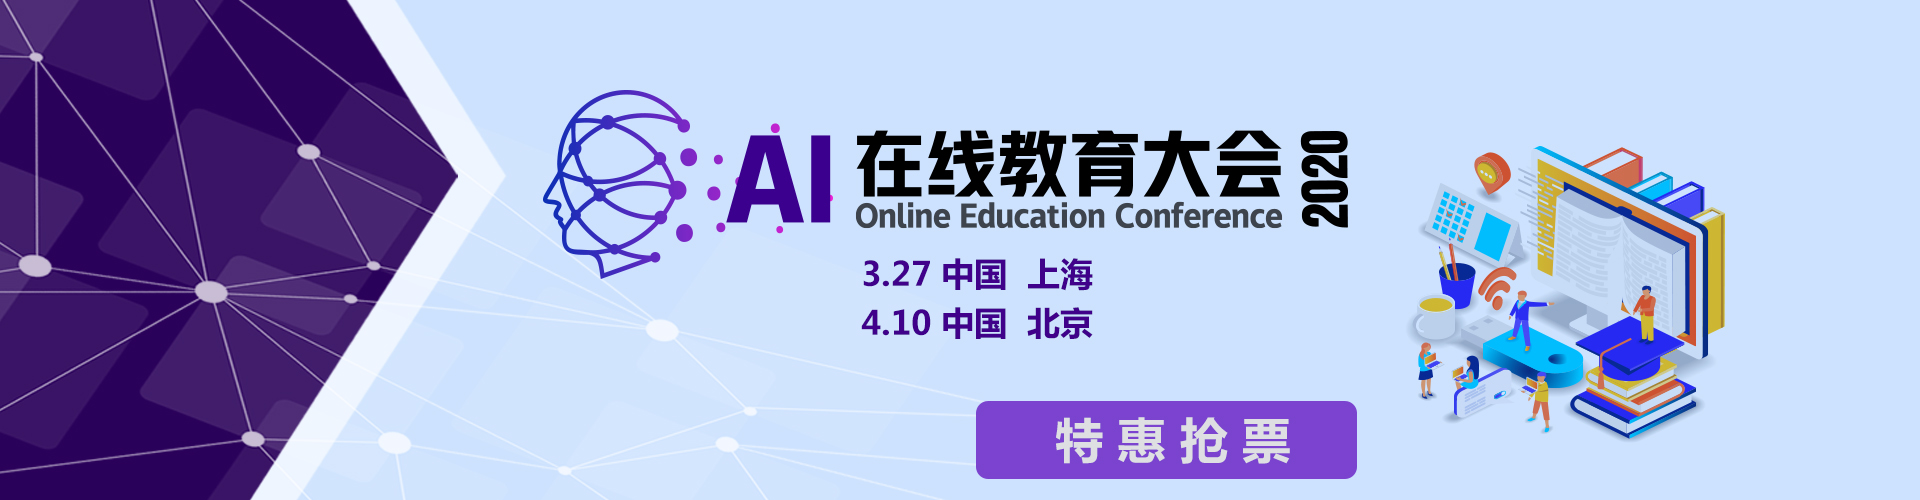 AI 在线教育大会2020.03.27 上海